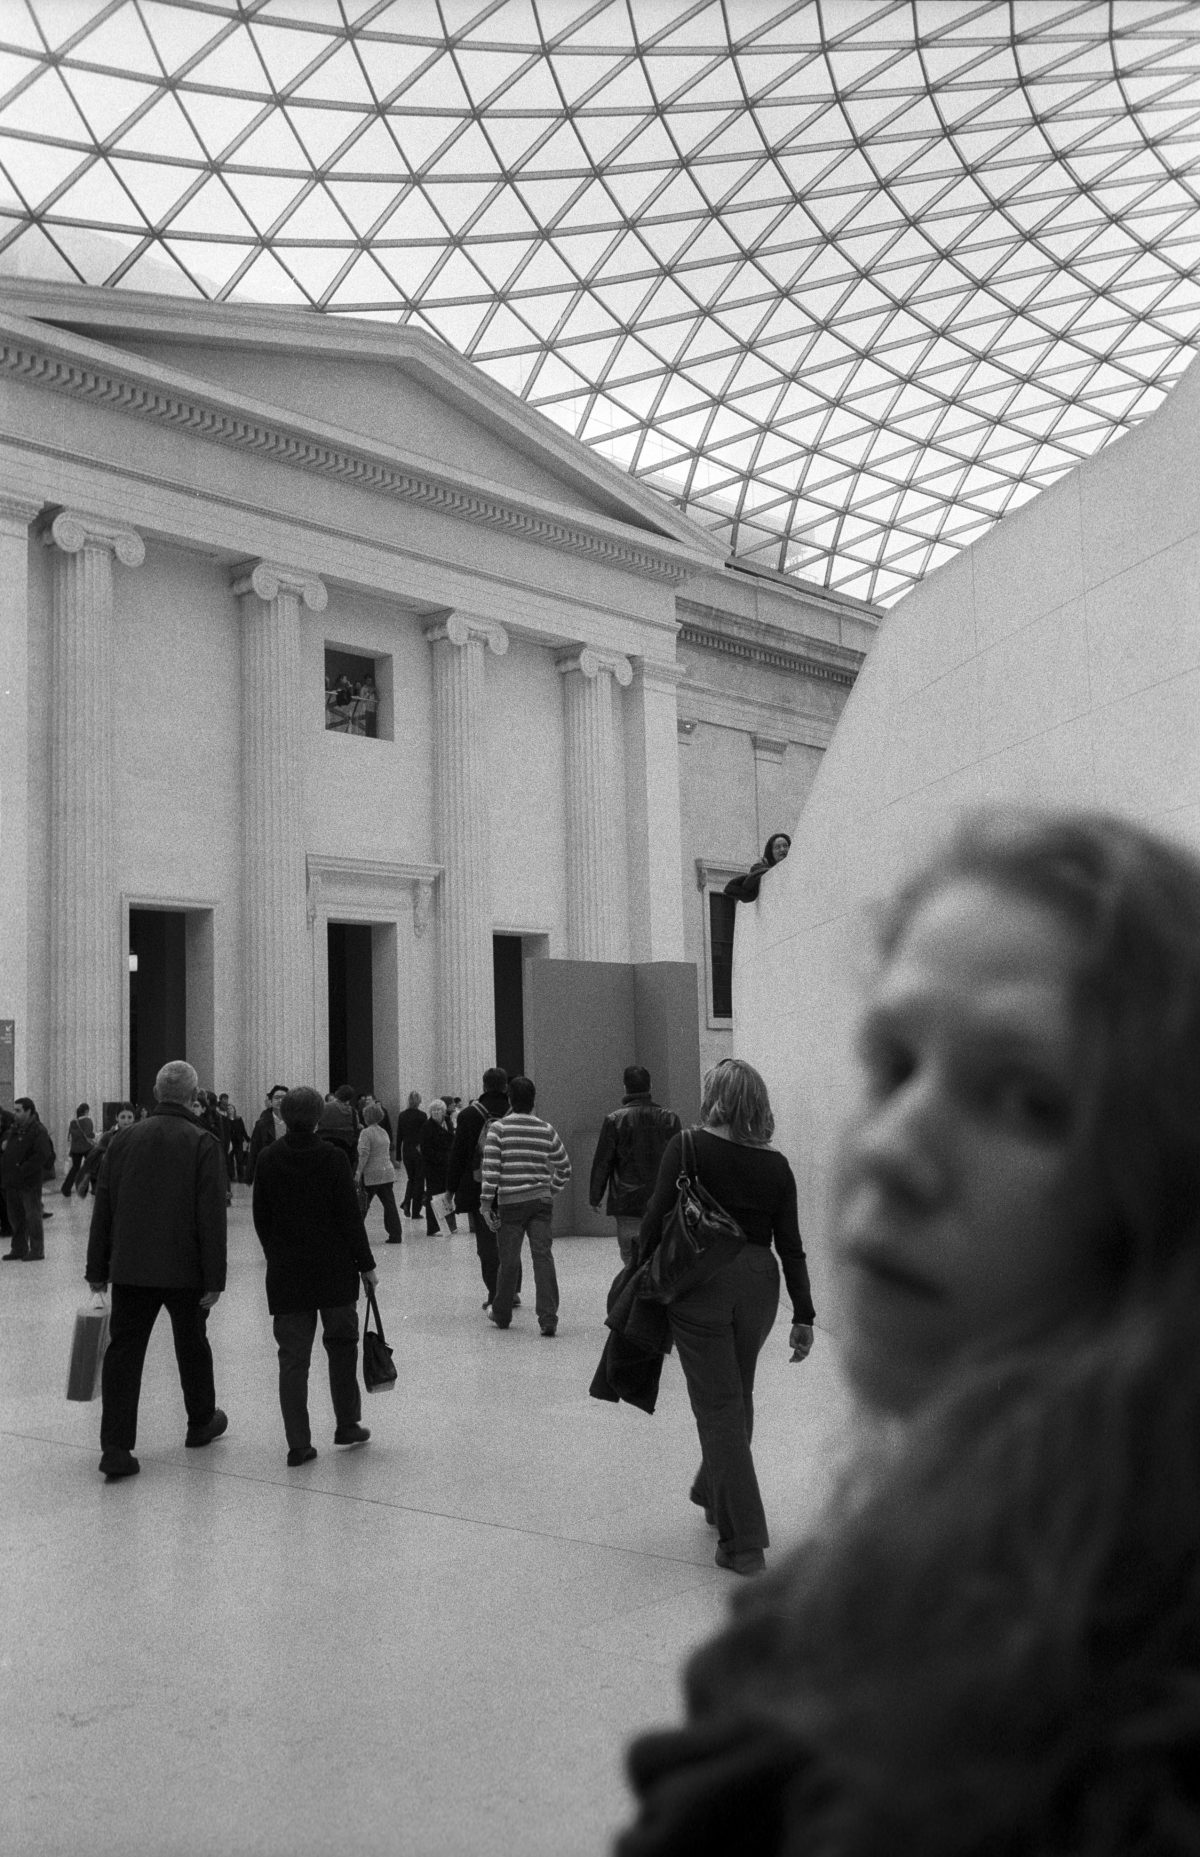 British museum, female, people, museum, face, bw